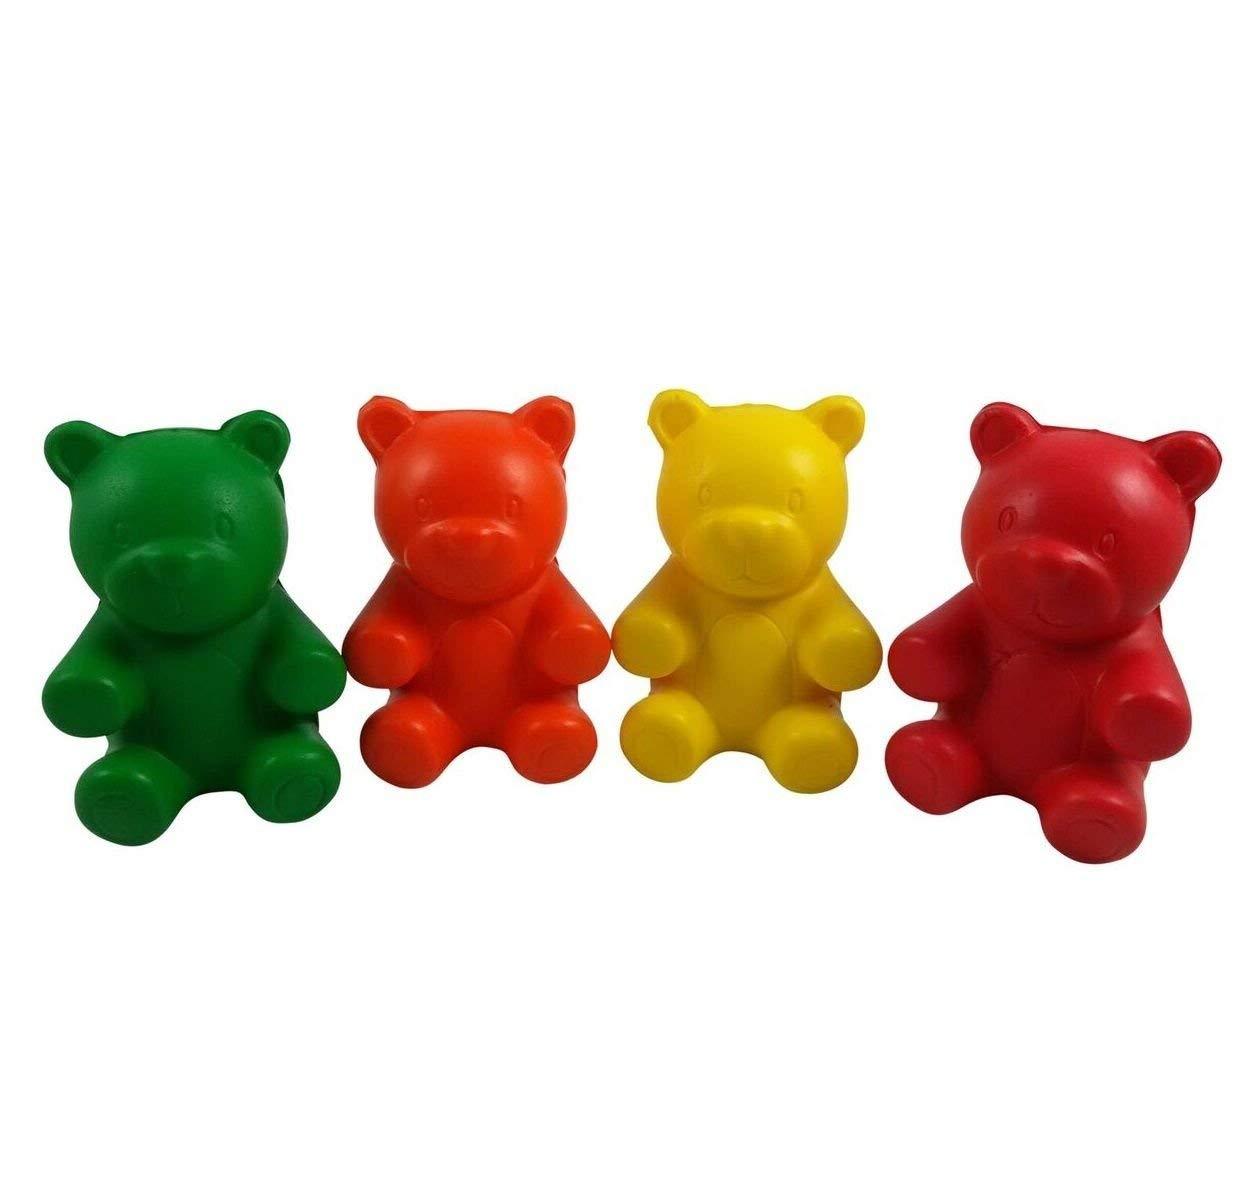 b2b8eb273 Get Quotations · (4) Gummy Bear Stress Balls for Kids Top Selling Item